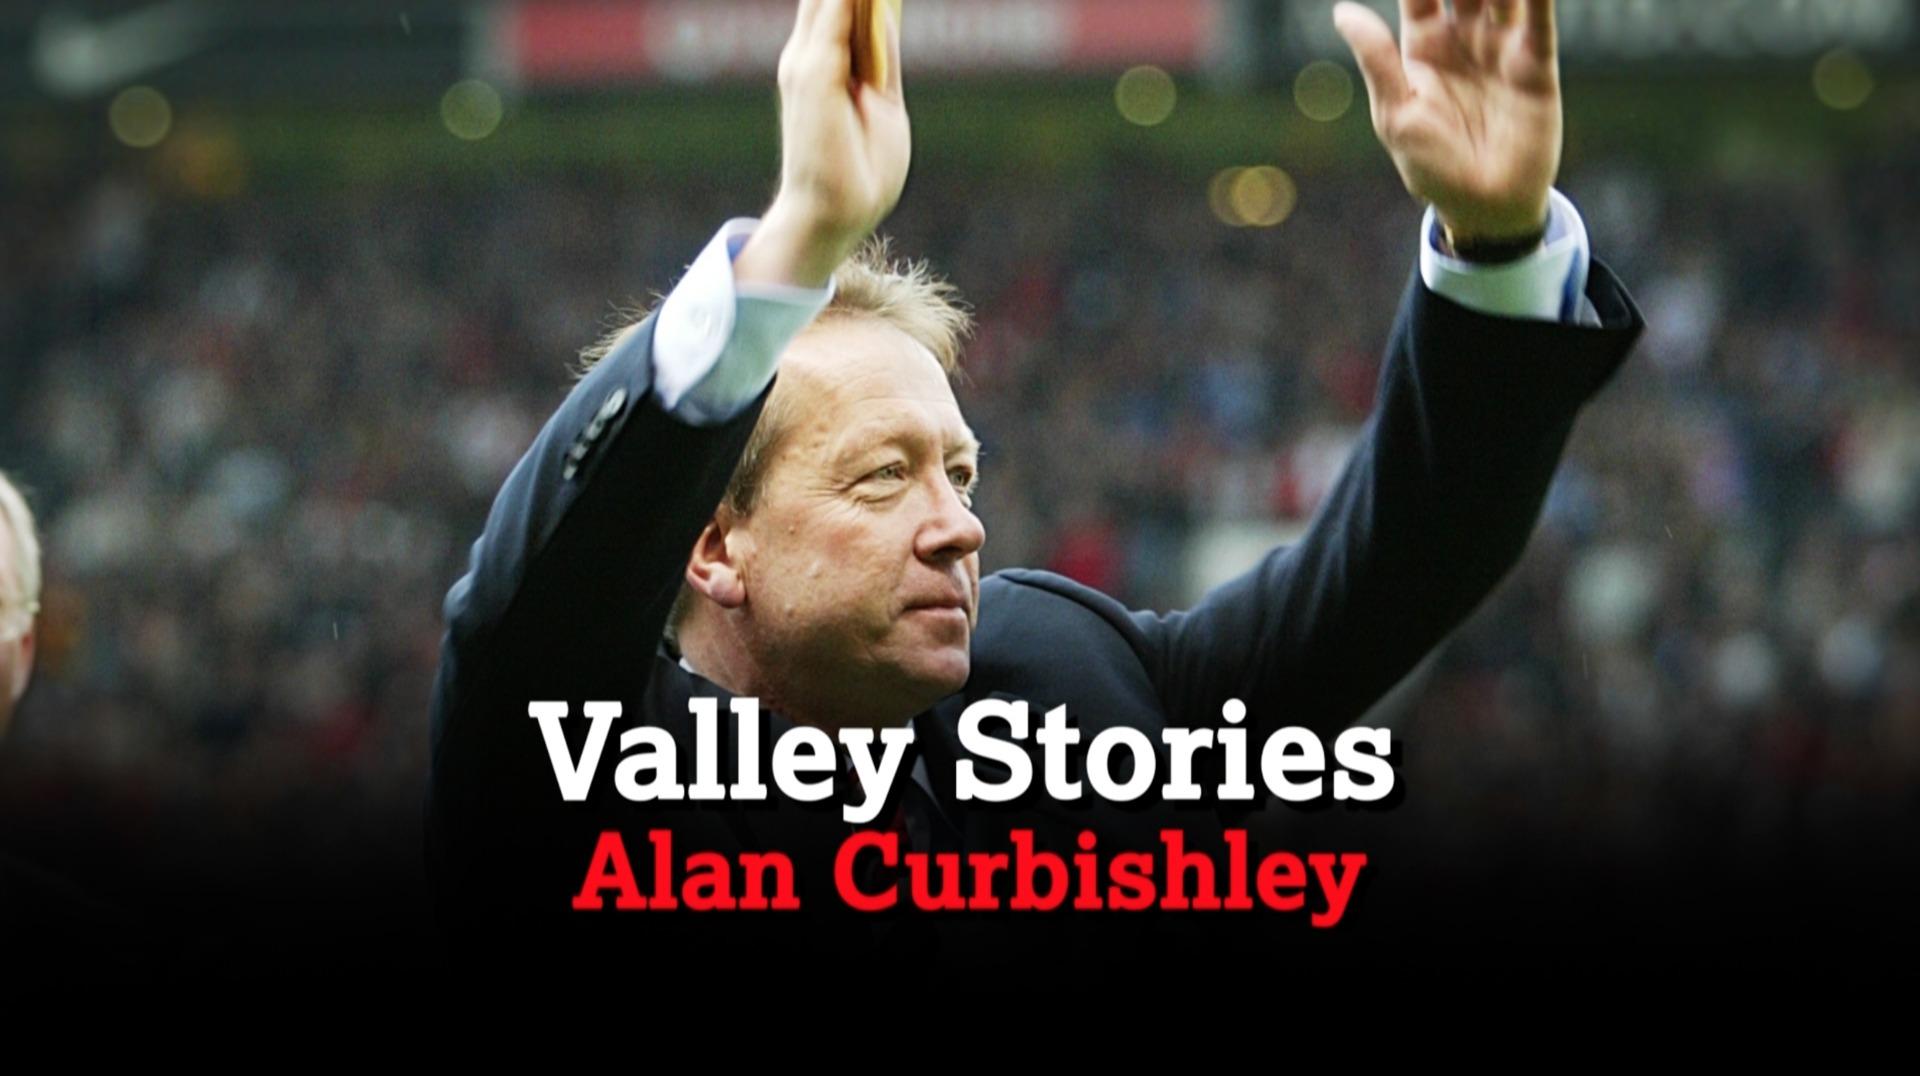 VALLEY STORIES | Alan Curbishley